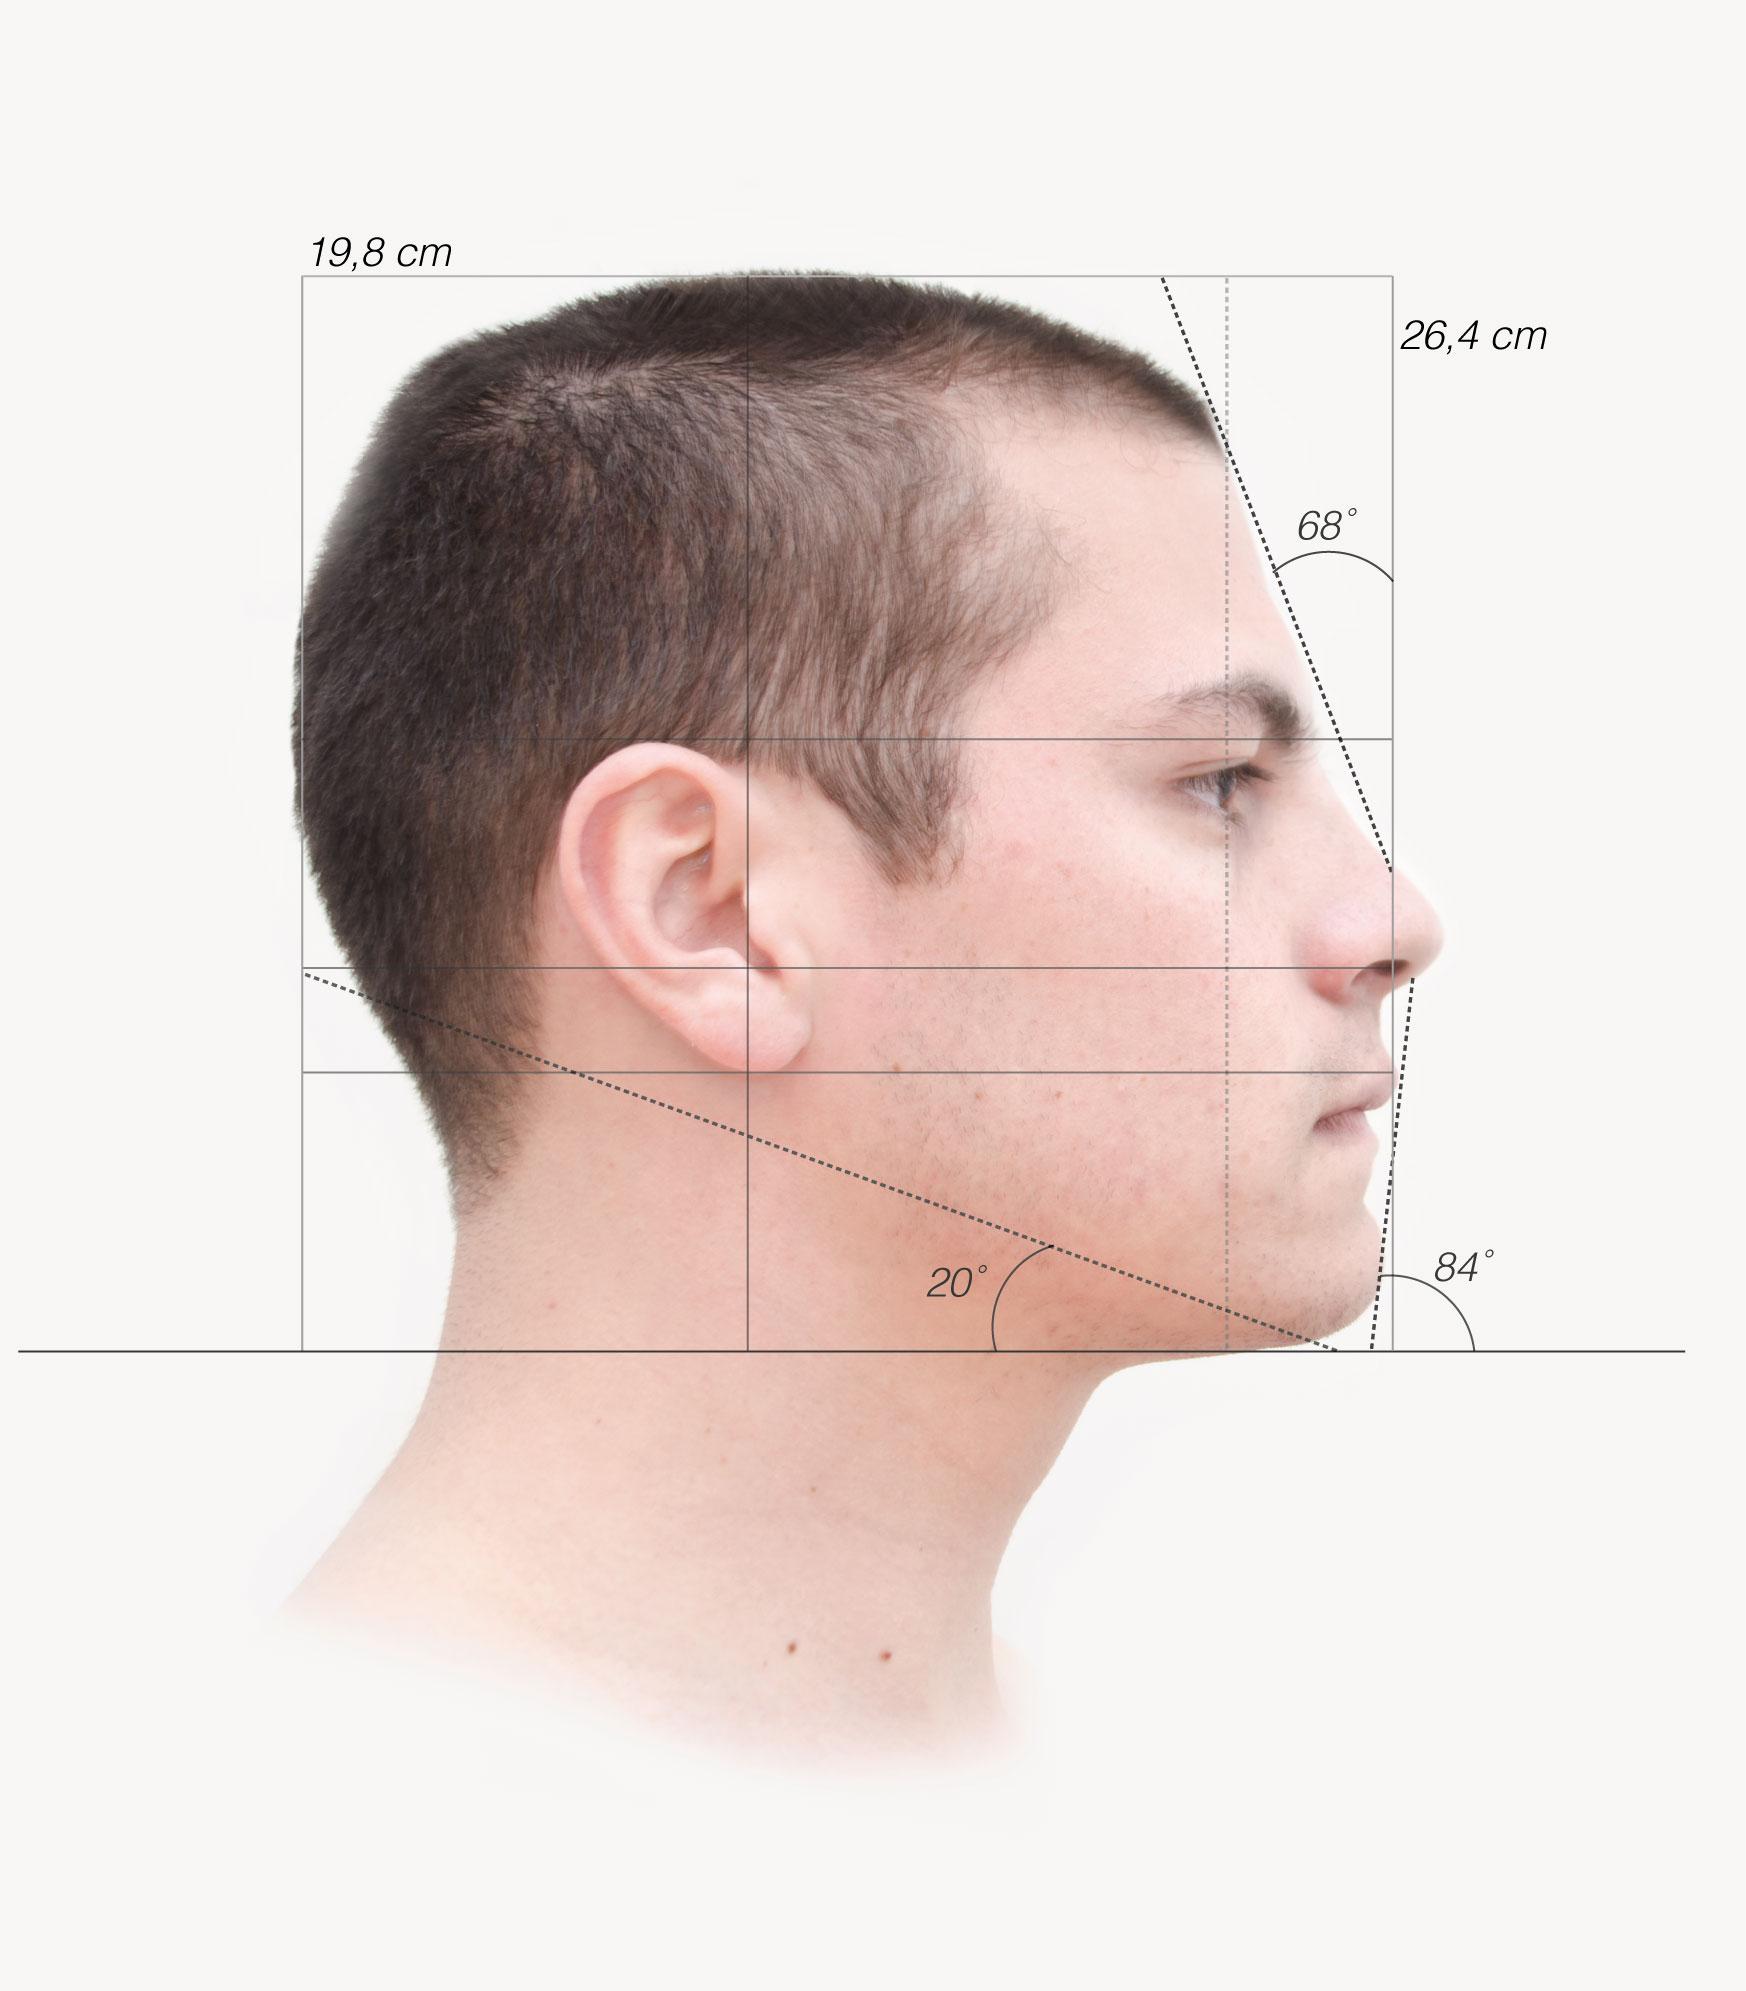 File:Camper Measurements on human male head.jpg - Wikimedia Commons